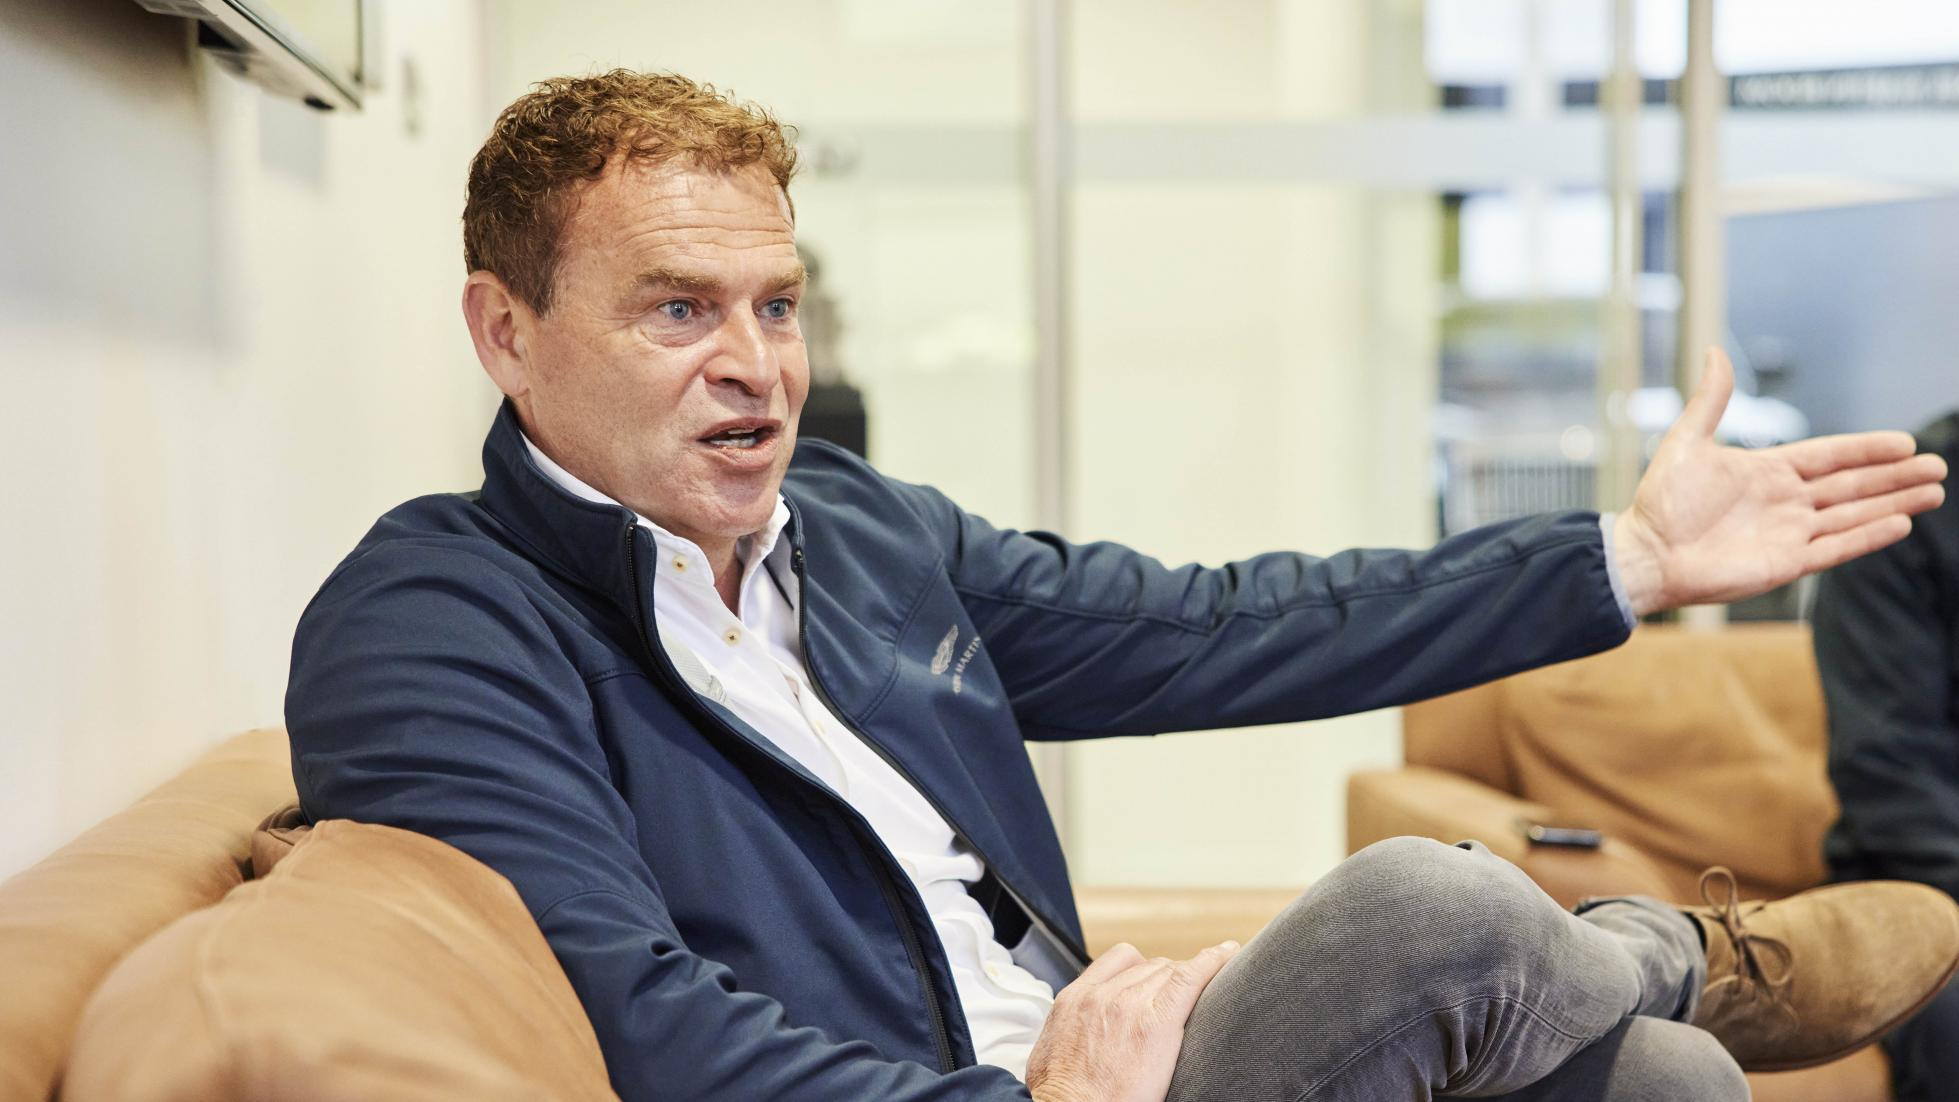 Tobias Moers wearing a blue Aston Martin jacket in an interview